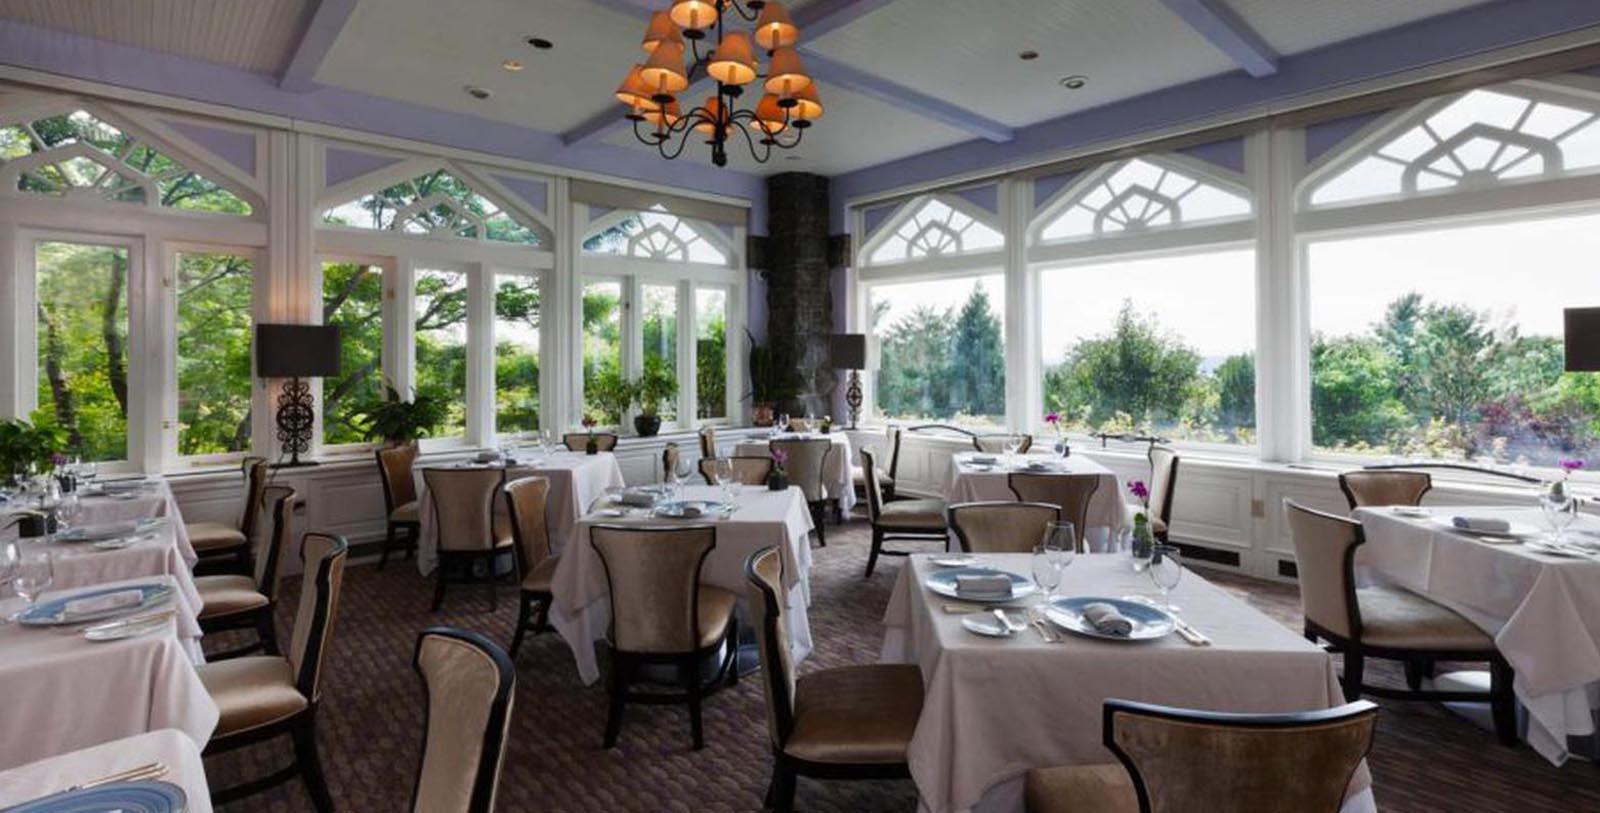 Image of Equus Restaurant at Castle Hotel & Spa, 1897, Member of Historic Hotels of America, in Tarrytown, New York City, Taste